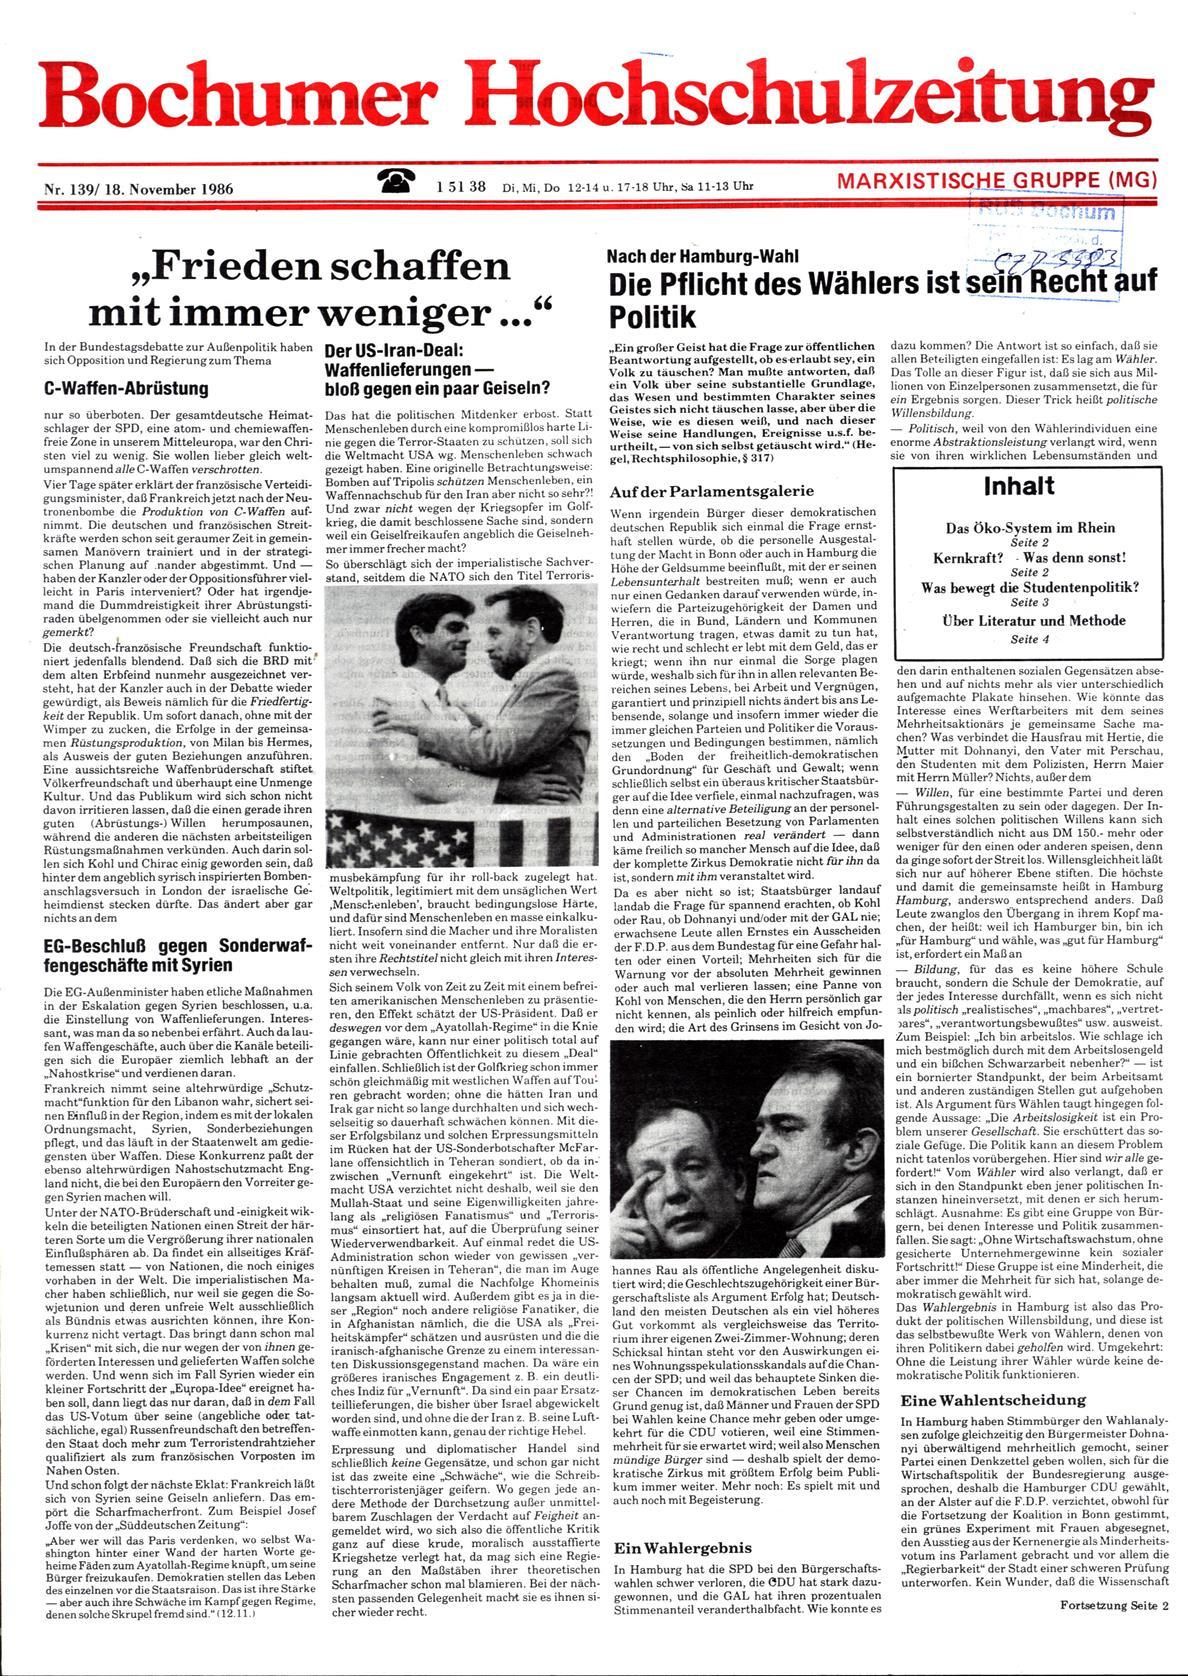 Bochum_BHZ_19861118_139_001